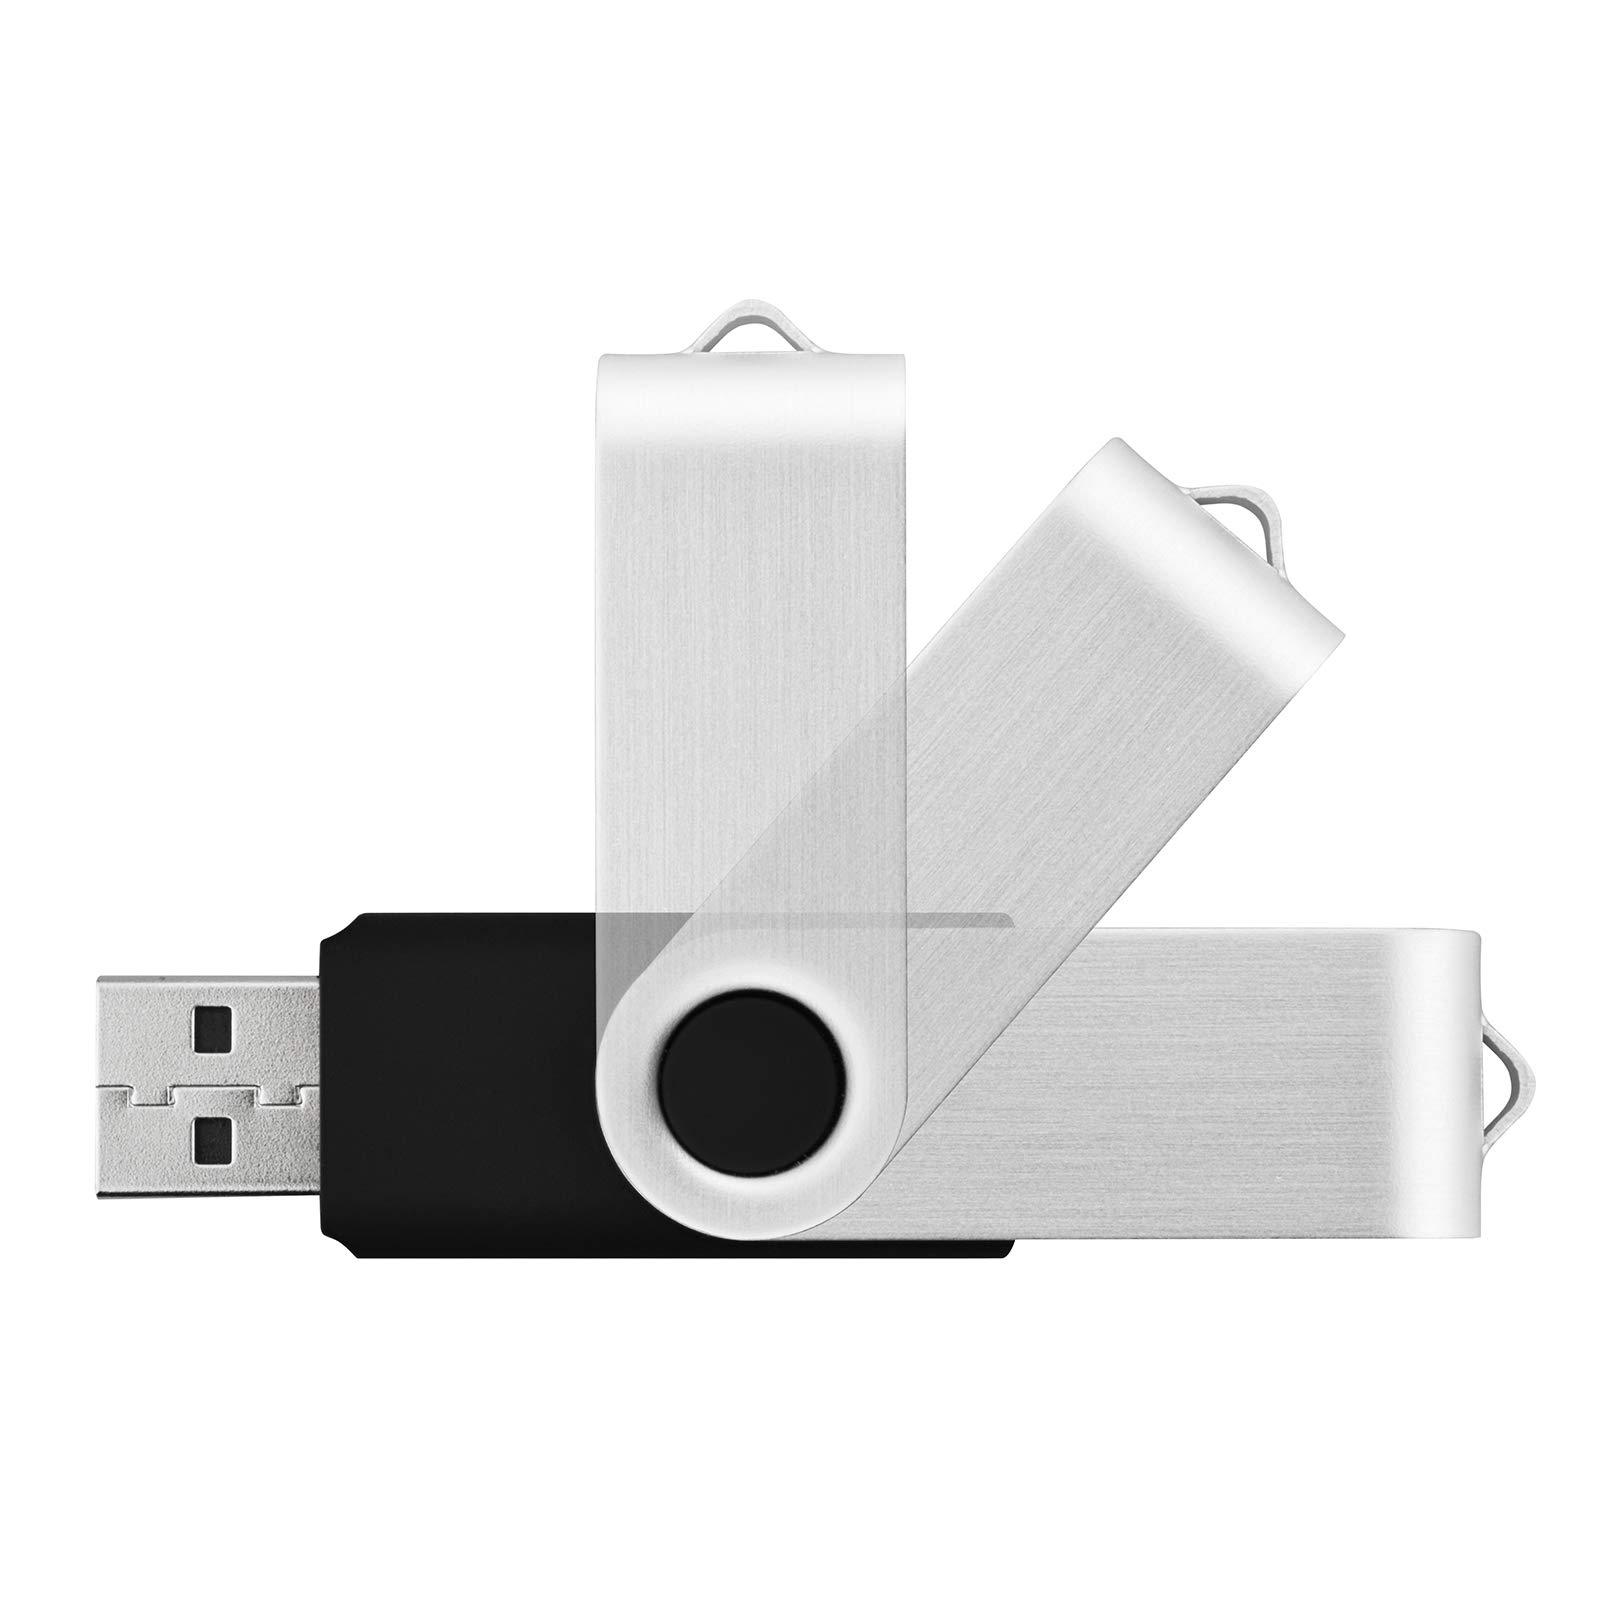 Kootion 50pcs 4 GB USB Flash Drive 4GB Flash Drives 50 Pack Thumb DriveSwivel Memory Stick Jump Drive, Black by KOOTION (Image #3)